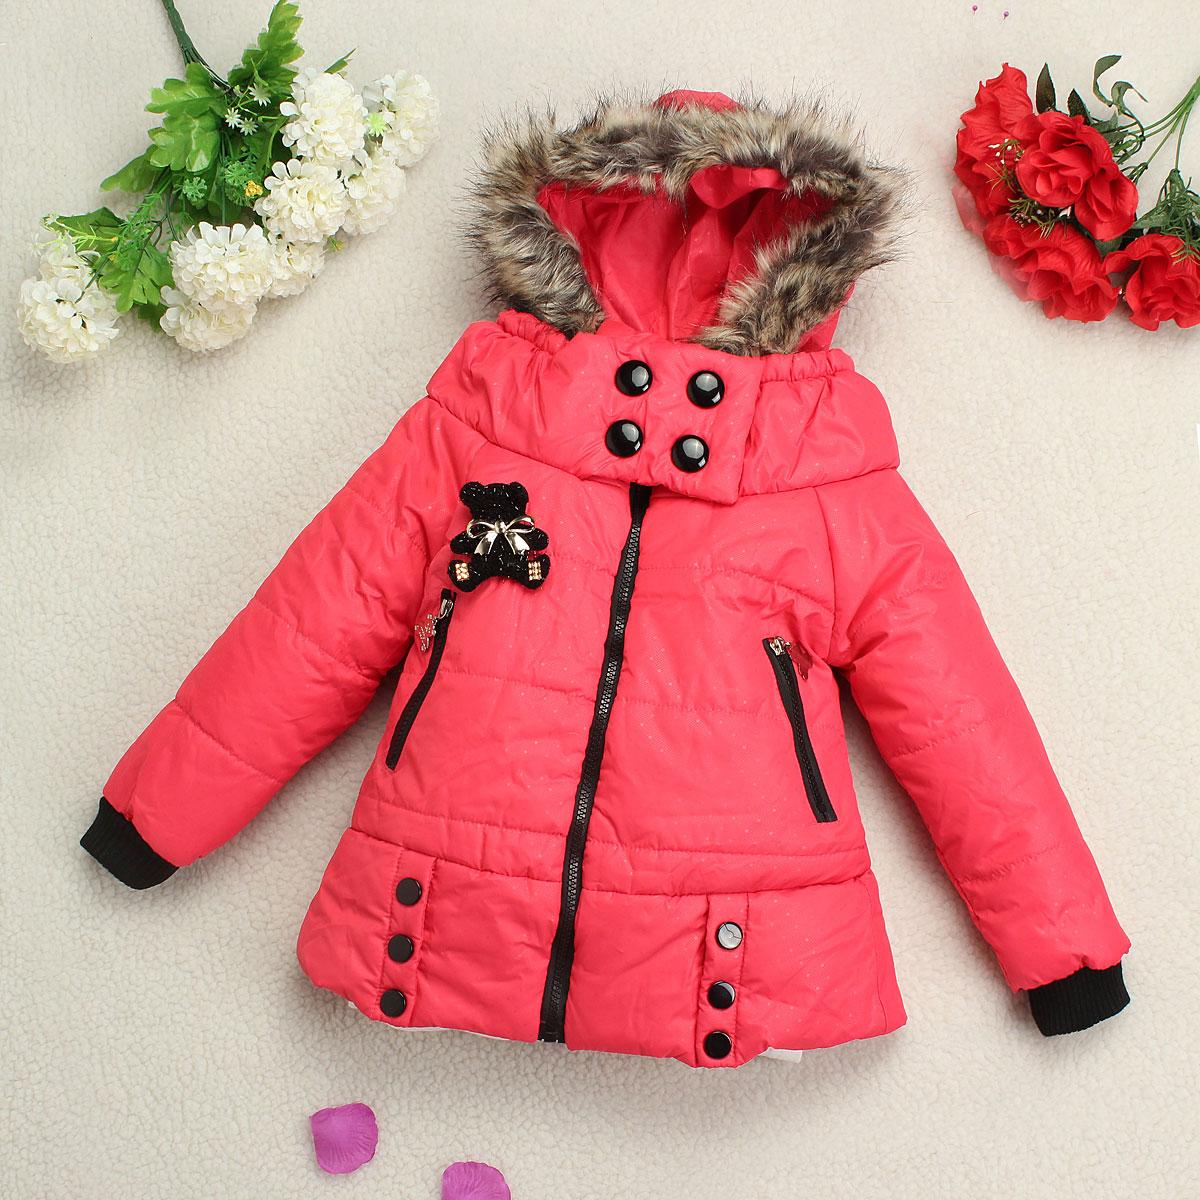 fille manteau tenues neige parka veste capuche hiver chaud enfant 2 7 ans ebay. Black Bedroom Furniture Sets. Home Design Ideas